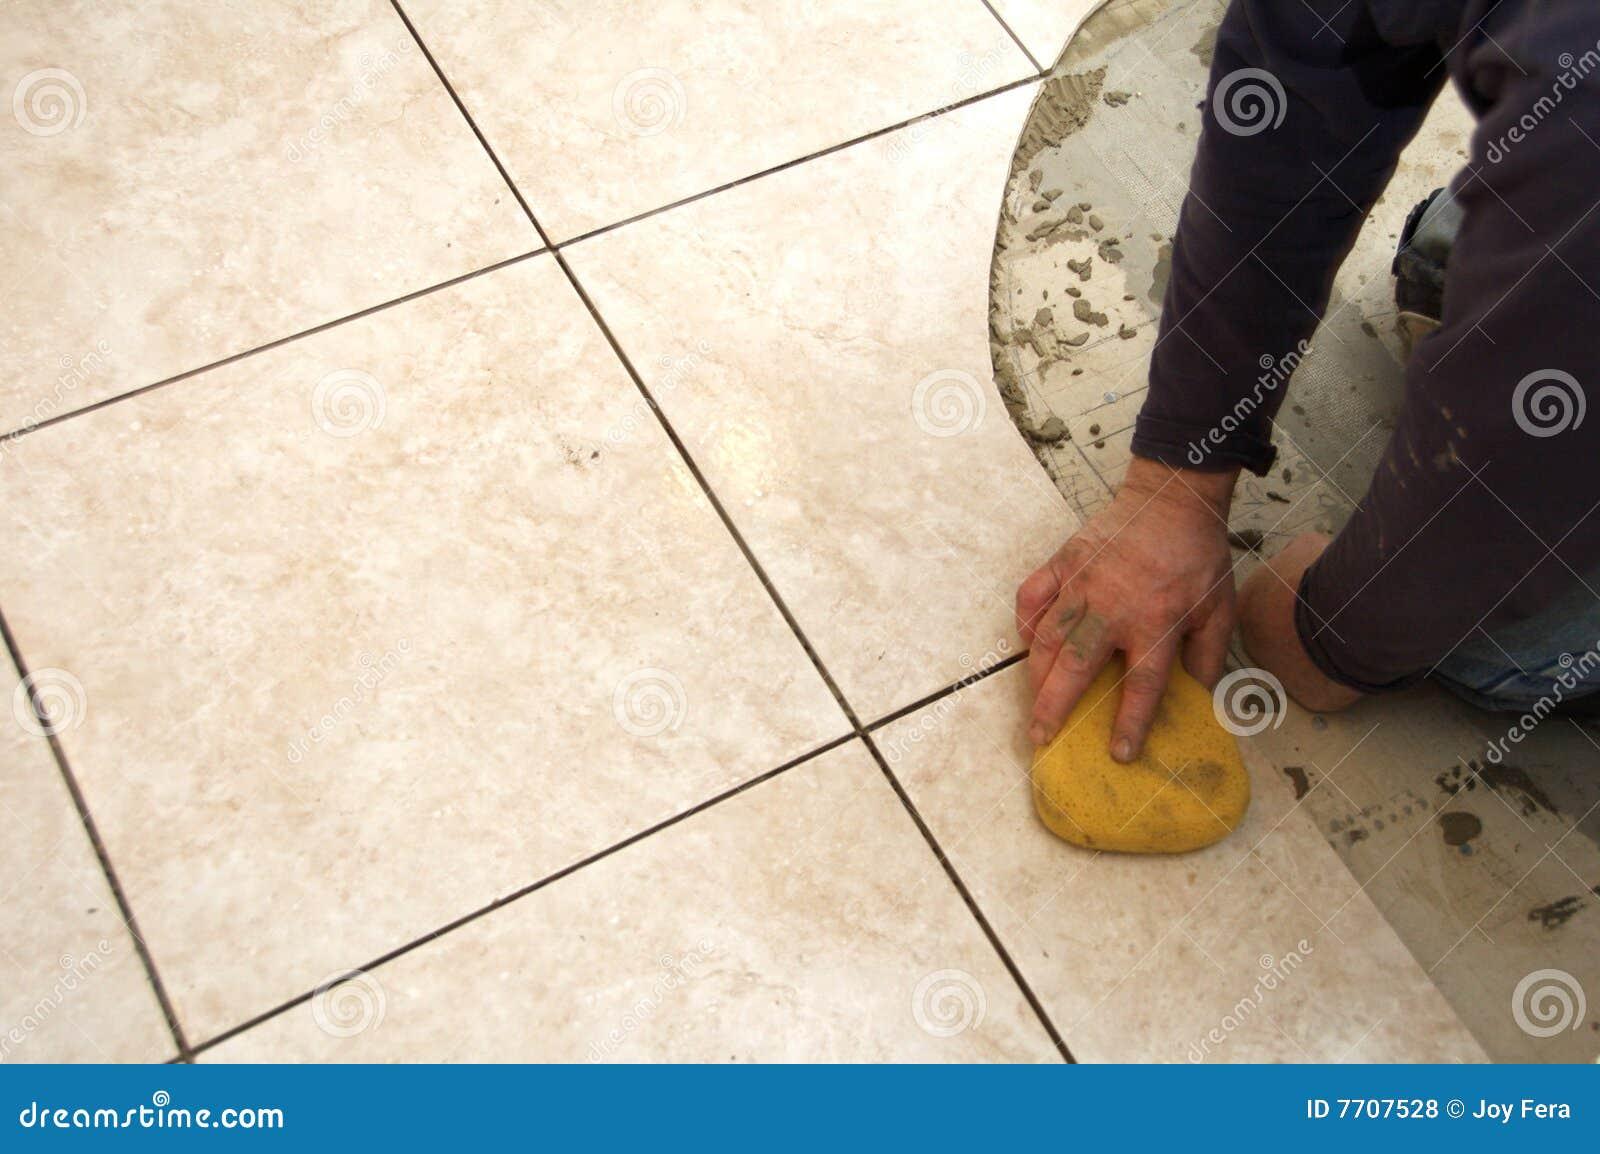 Ceramic tile installation royalty free stock photos for Ceramic floor installation